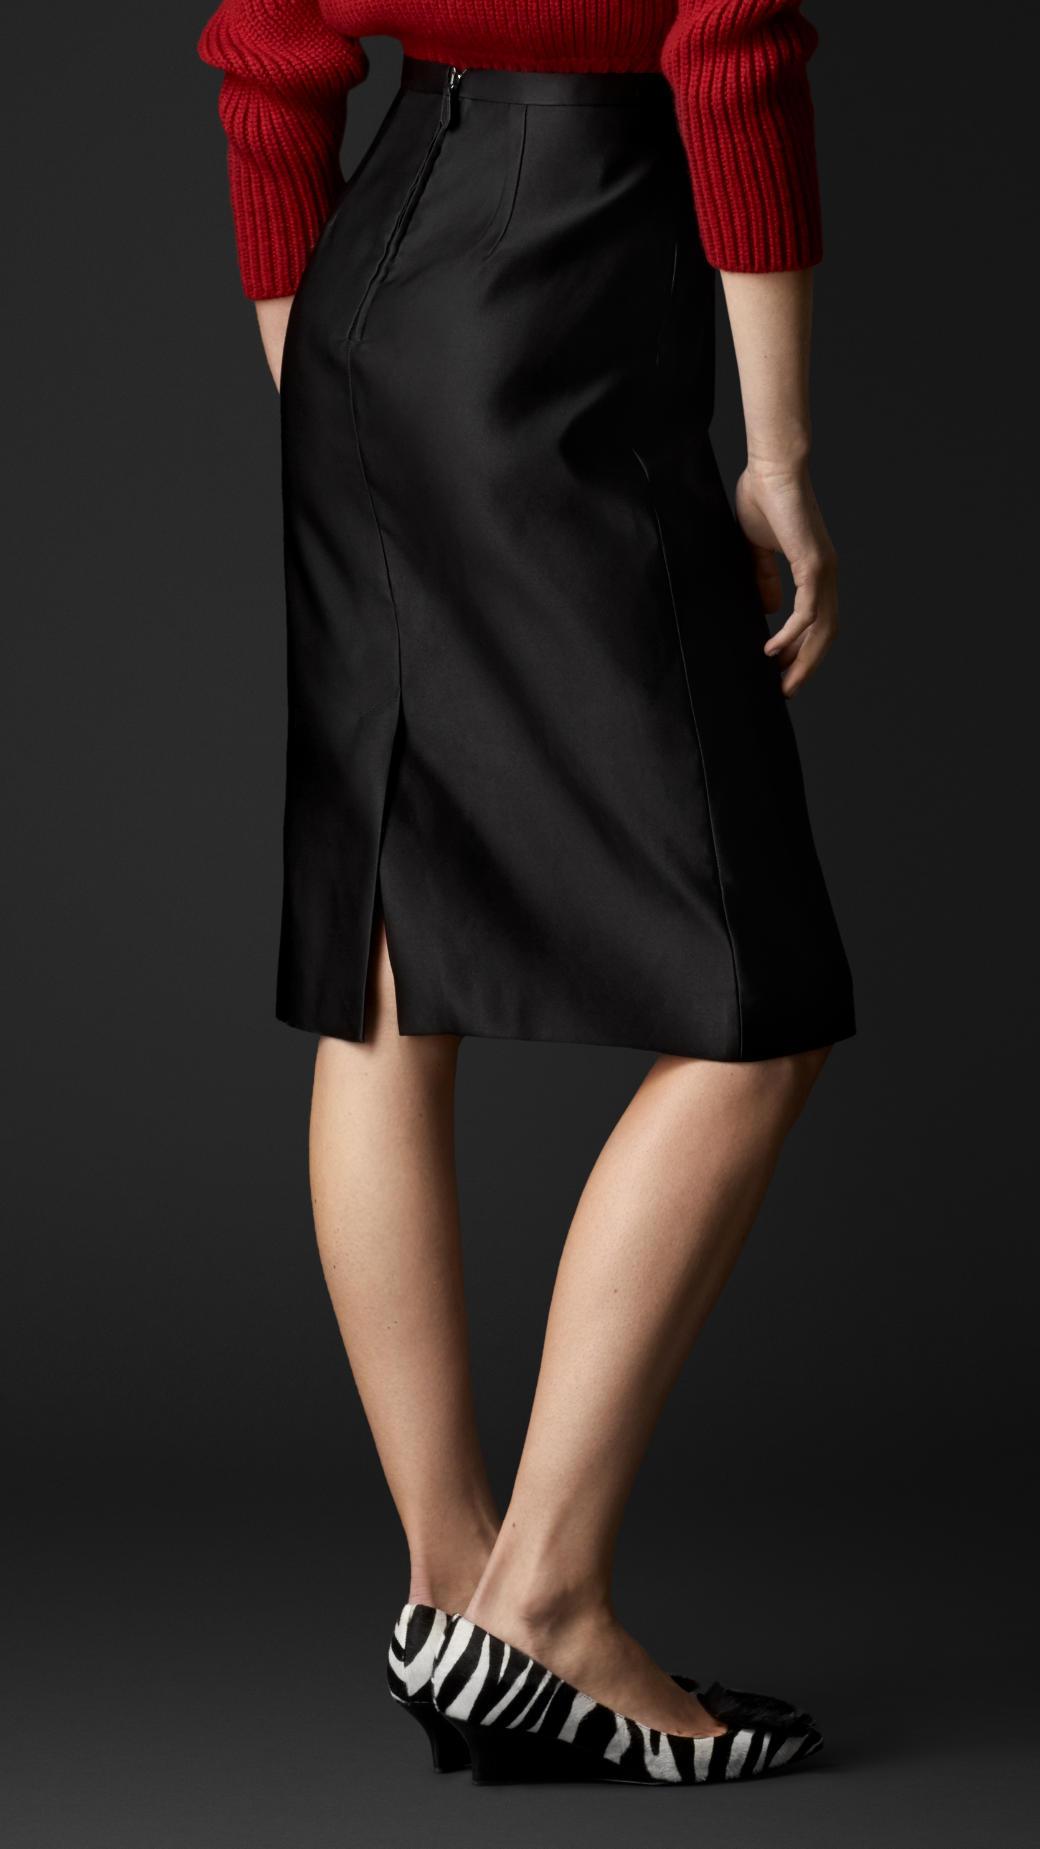 fdc3086fb886fb Burberry Duchess Silk Satin Pencil Skirt in Black - Lyst